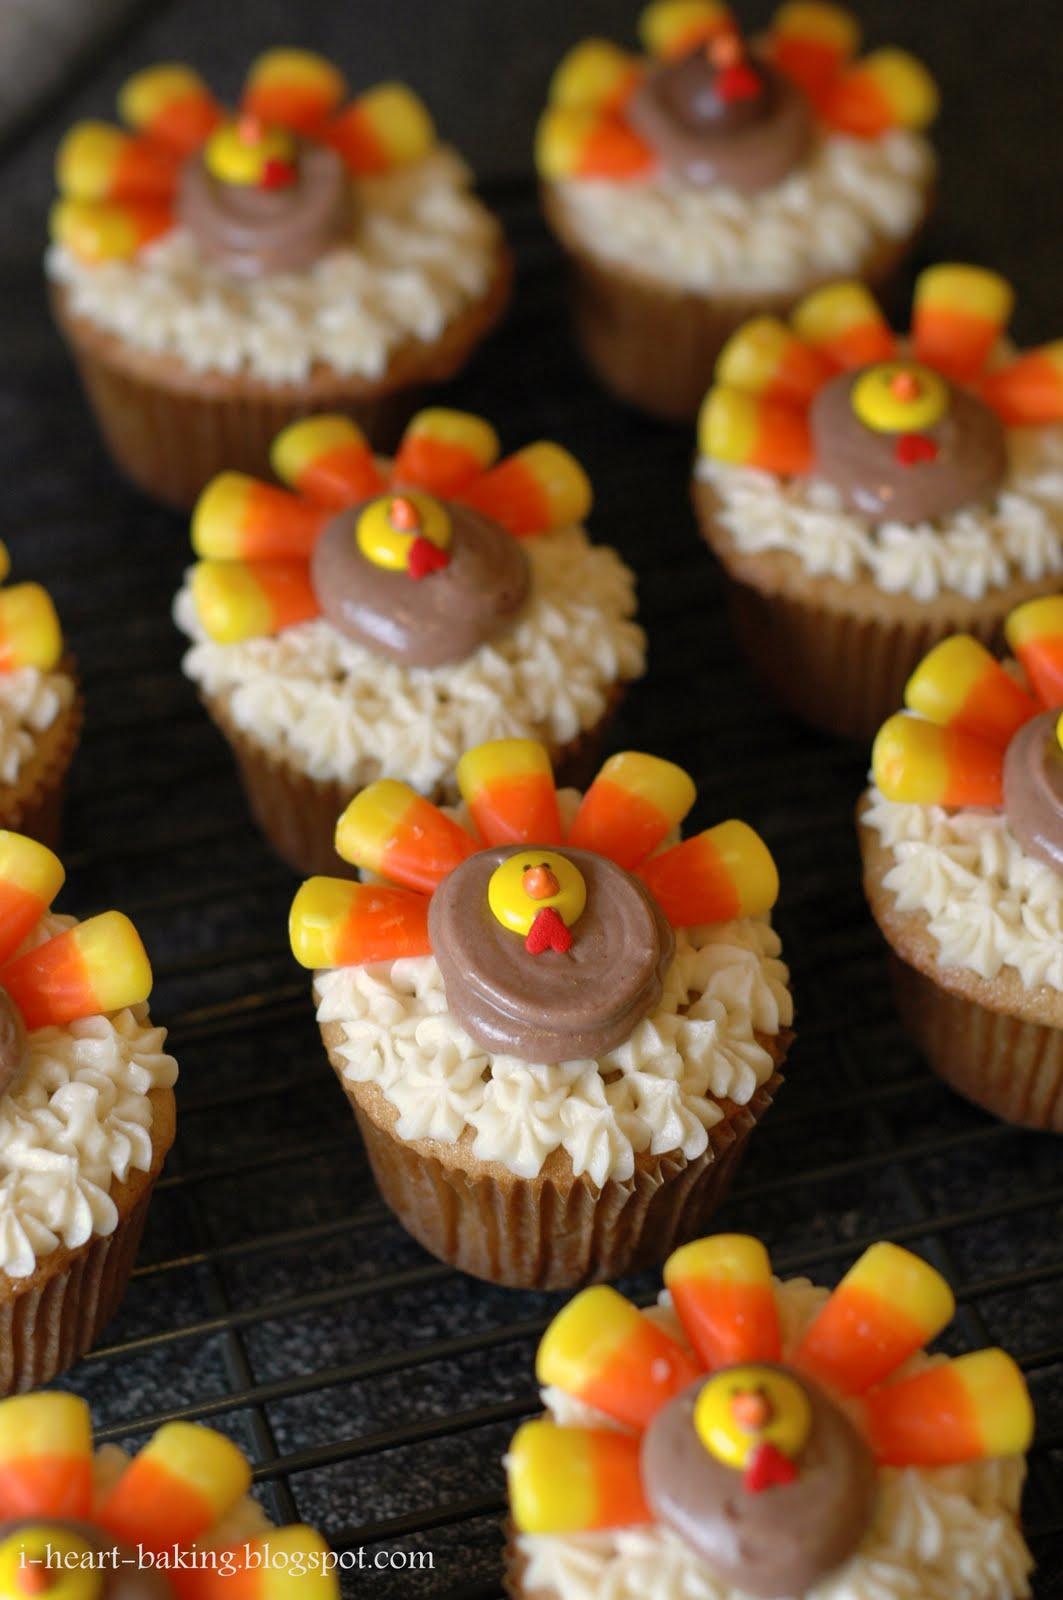 Thanksgiving Turkey Cupcakes Brown Sugar Pound Cakes With Baileys Irish Cream Frosting